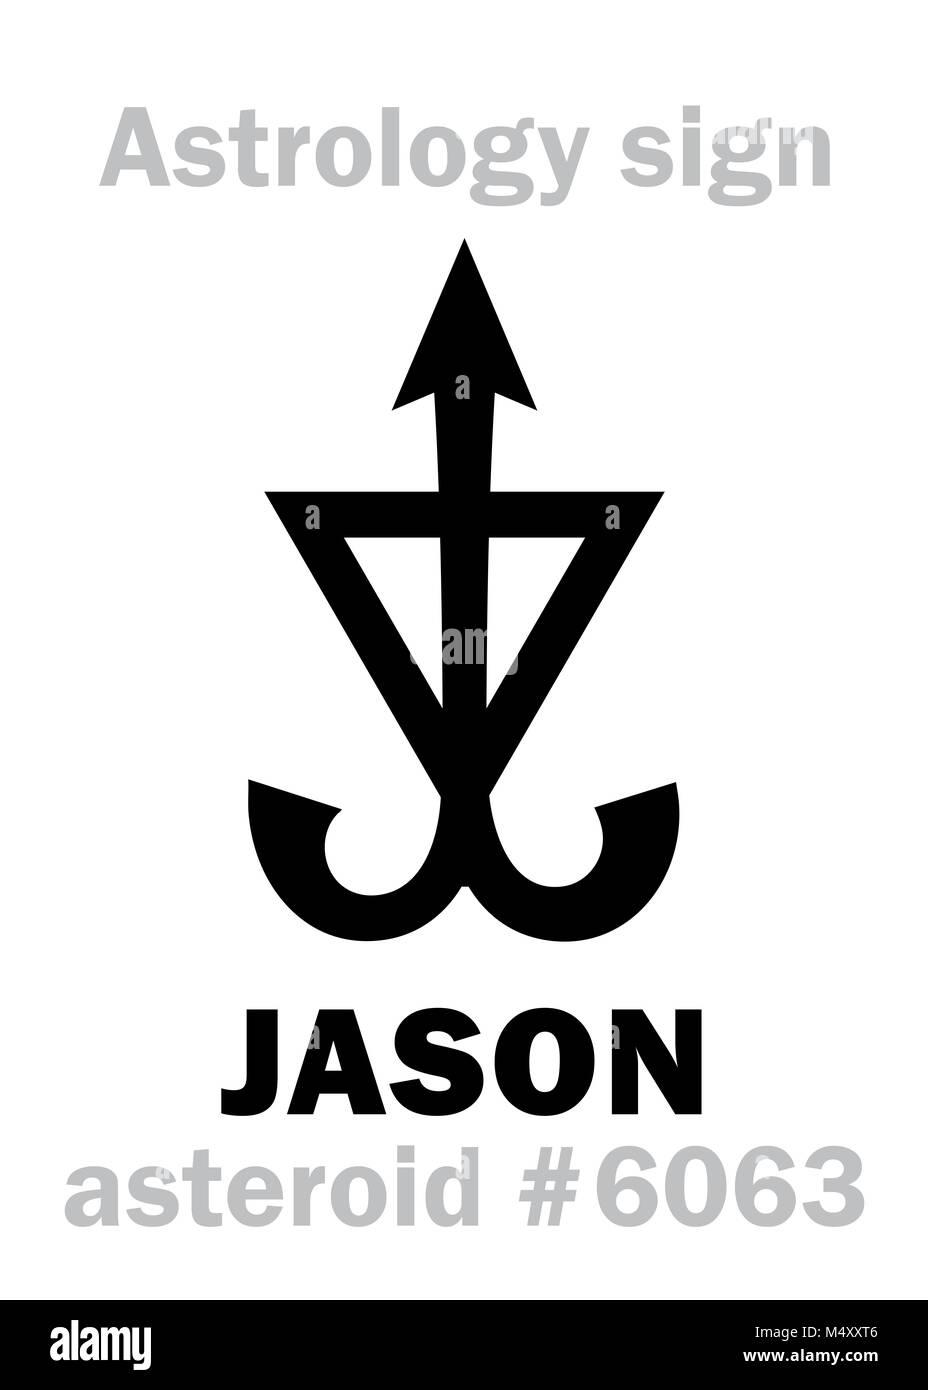 Chiron And Jason Stock Photos Chiron And Jason Stock Images Alamy